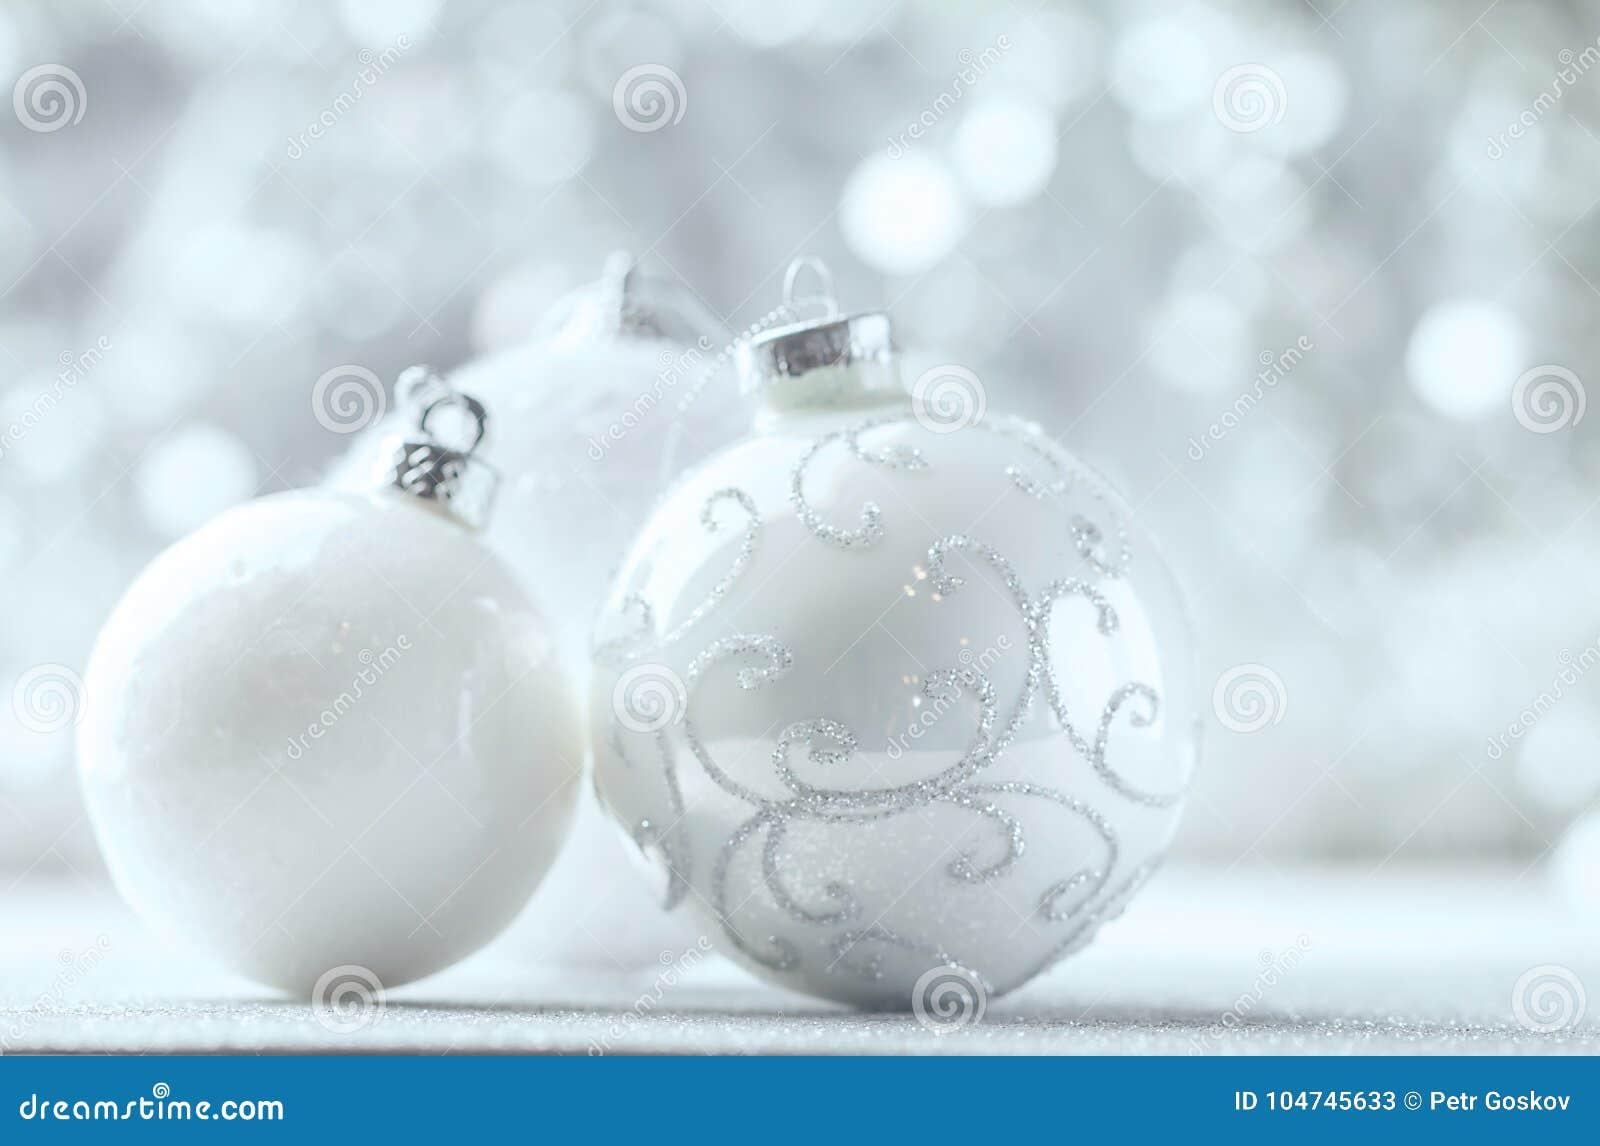 silver and white christmas balls - White Christmas Balls